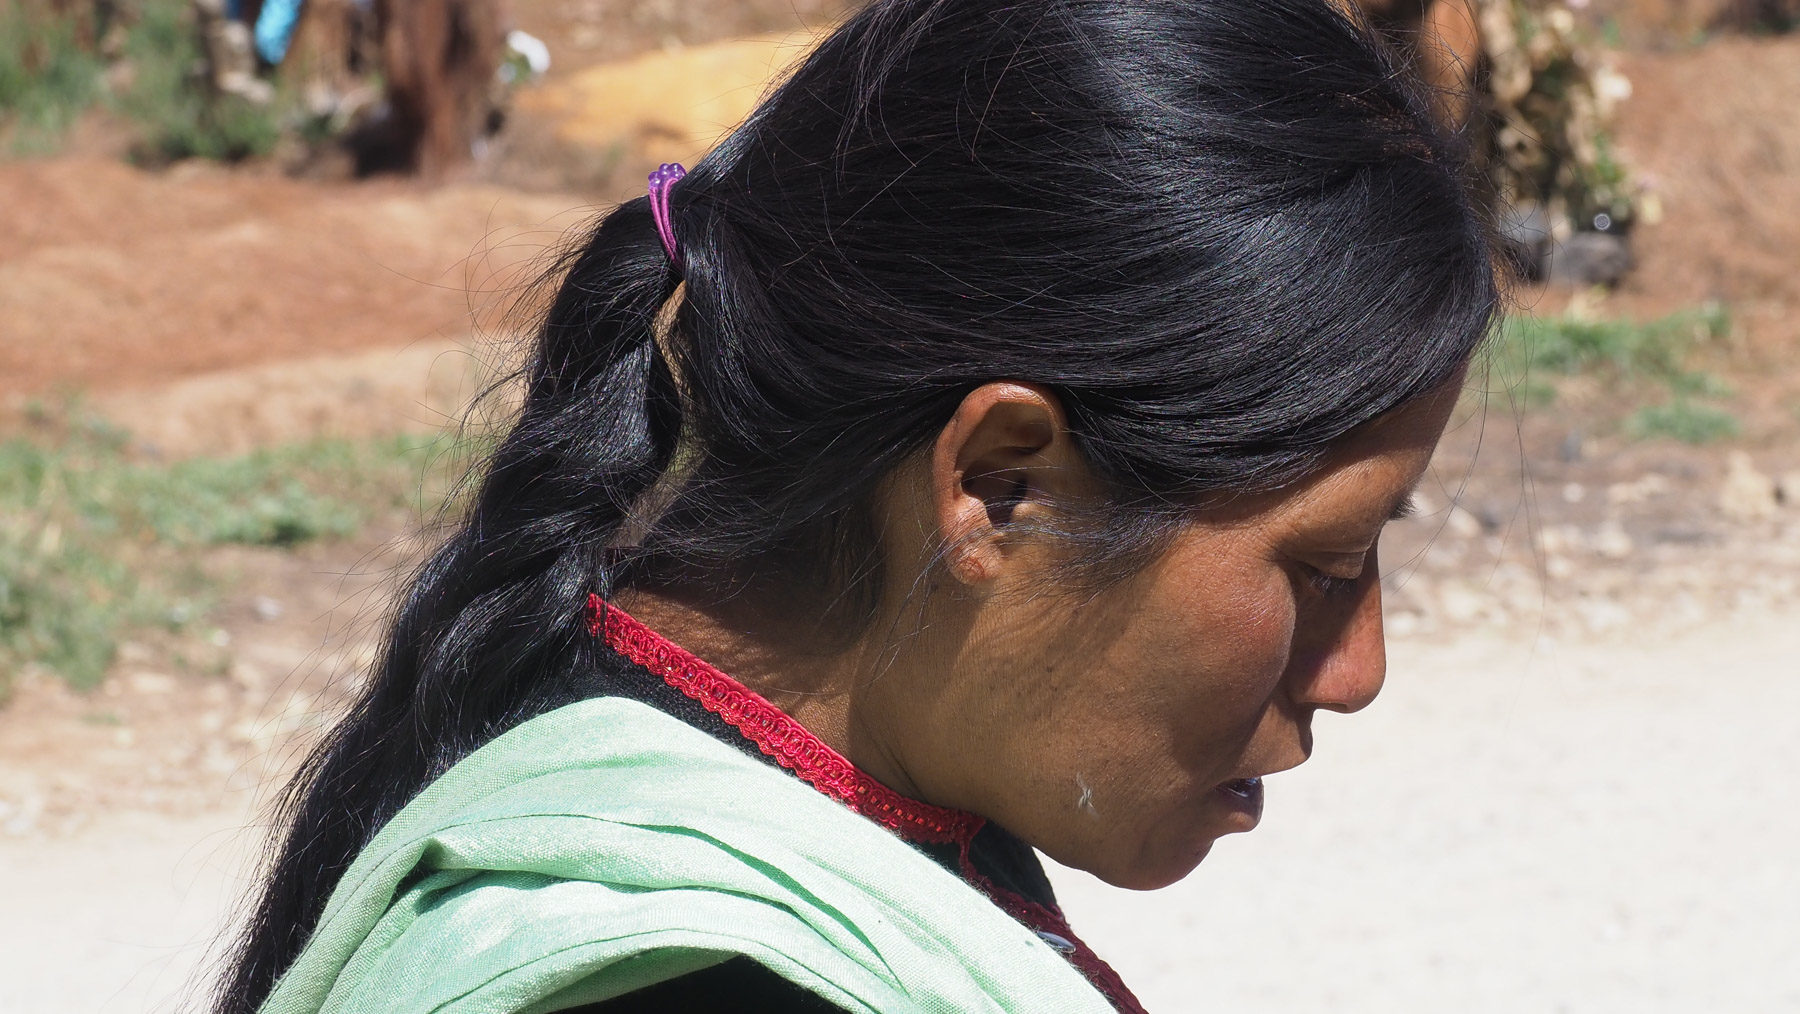 Indigene Frau auf dem Weg zum Markt